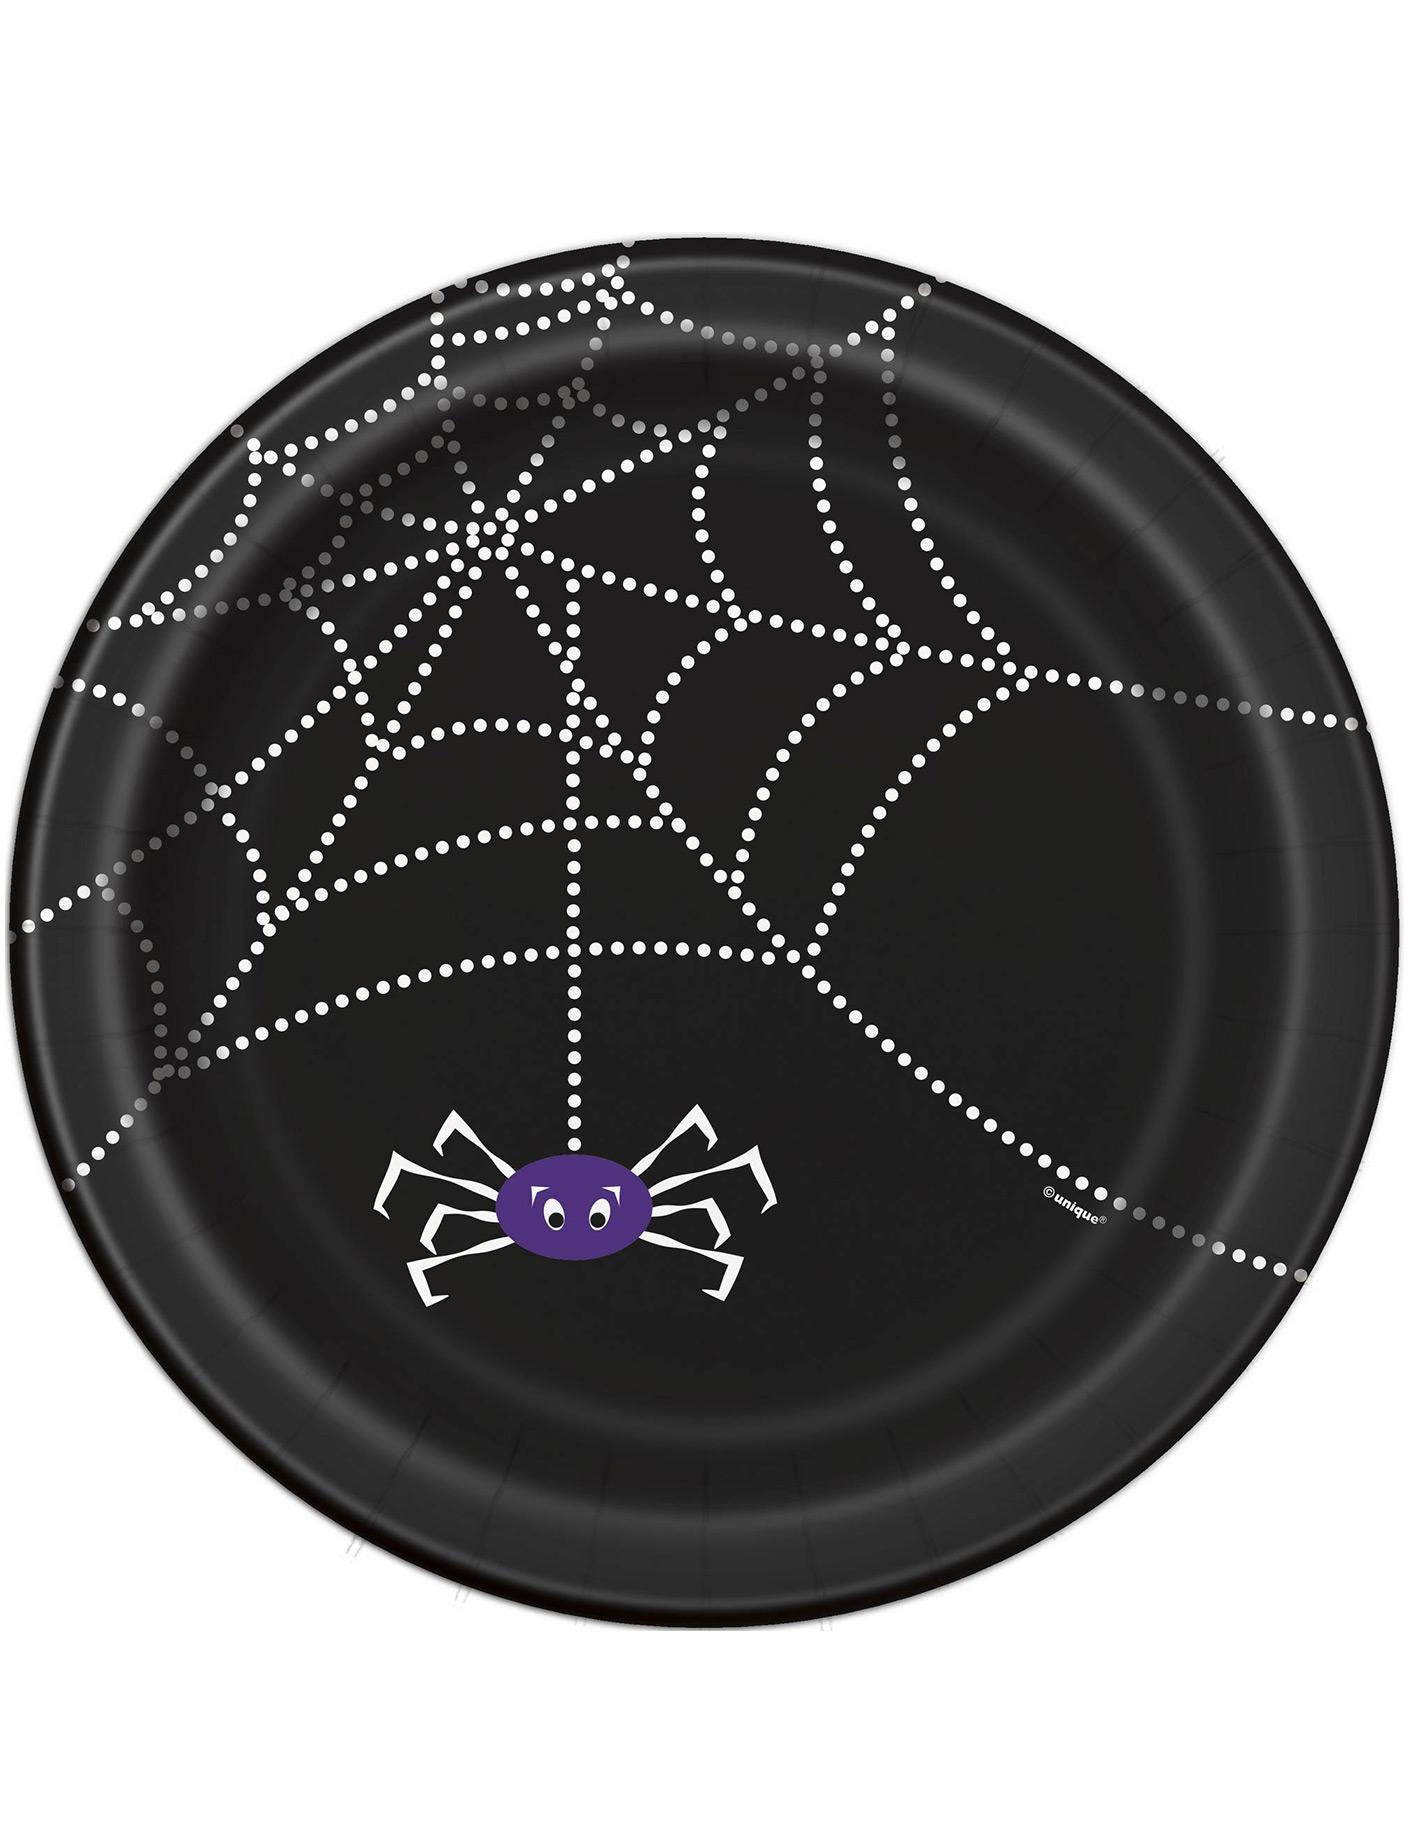 spinnen teller halloween pappteller set 8 st ck schwarz weiss 23cm g nstige faschings. Black Bedroom Furniture Sets. Home Design Ideas